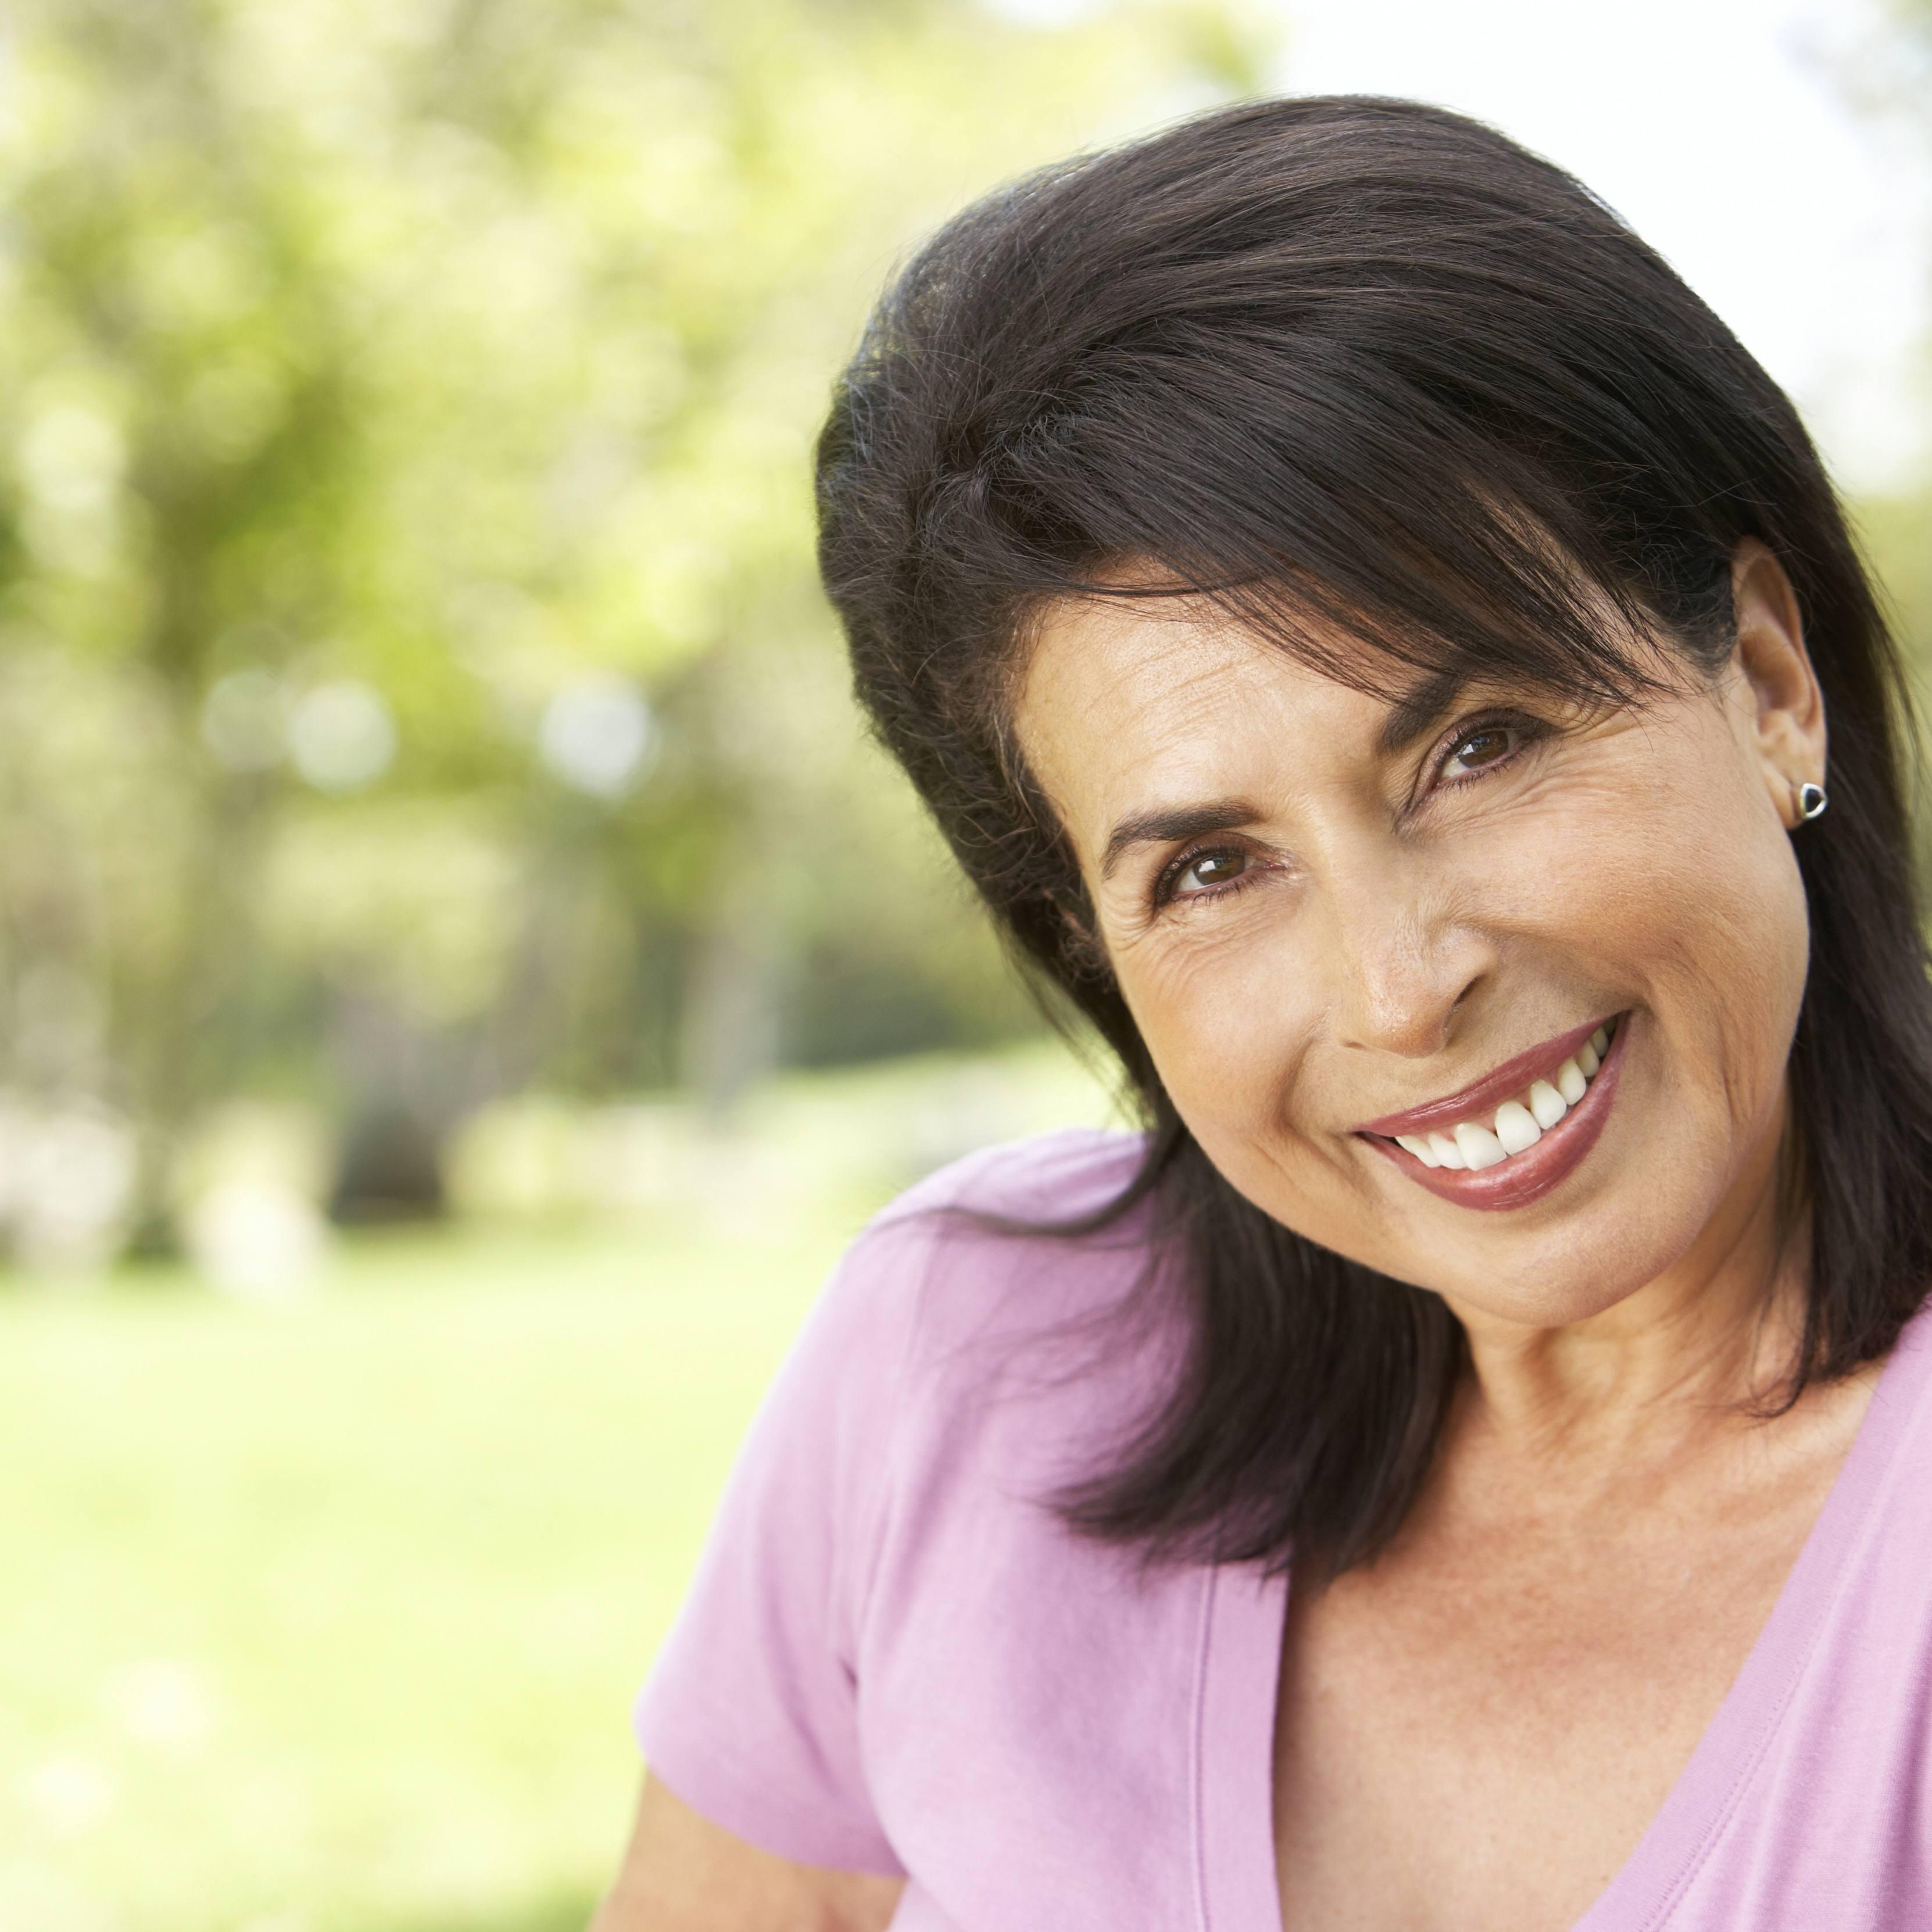 Portrait of a senior woman in a park